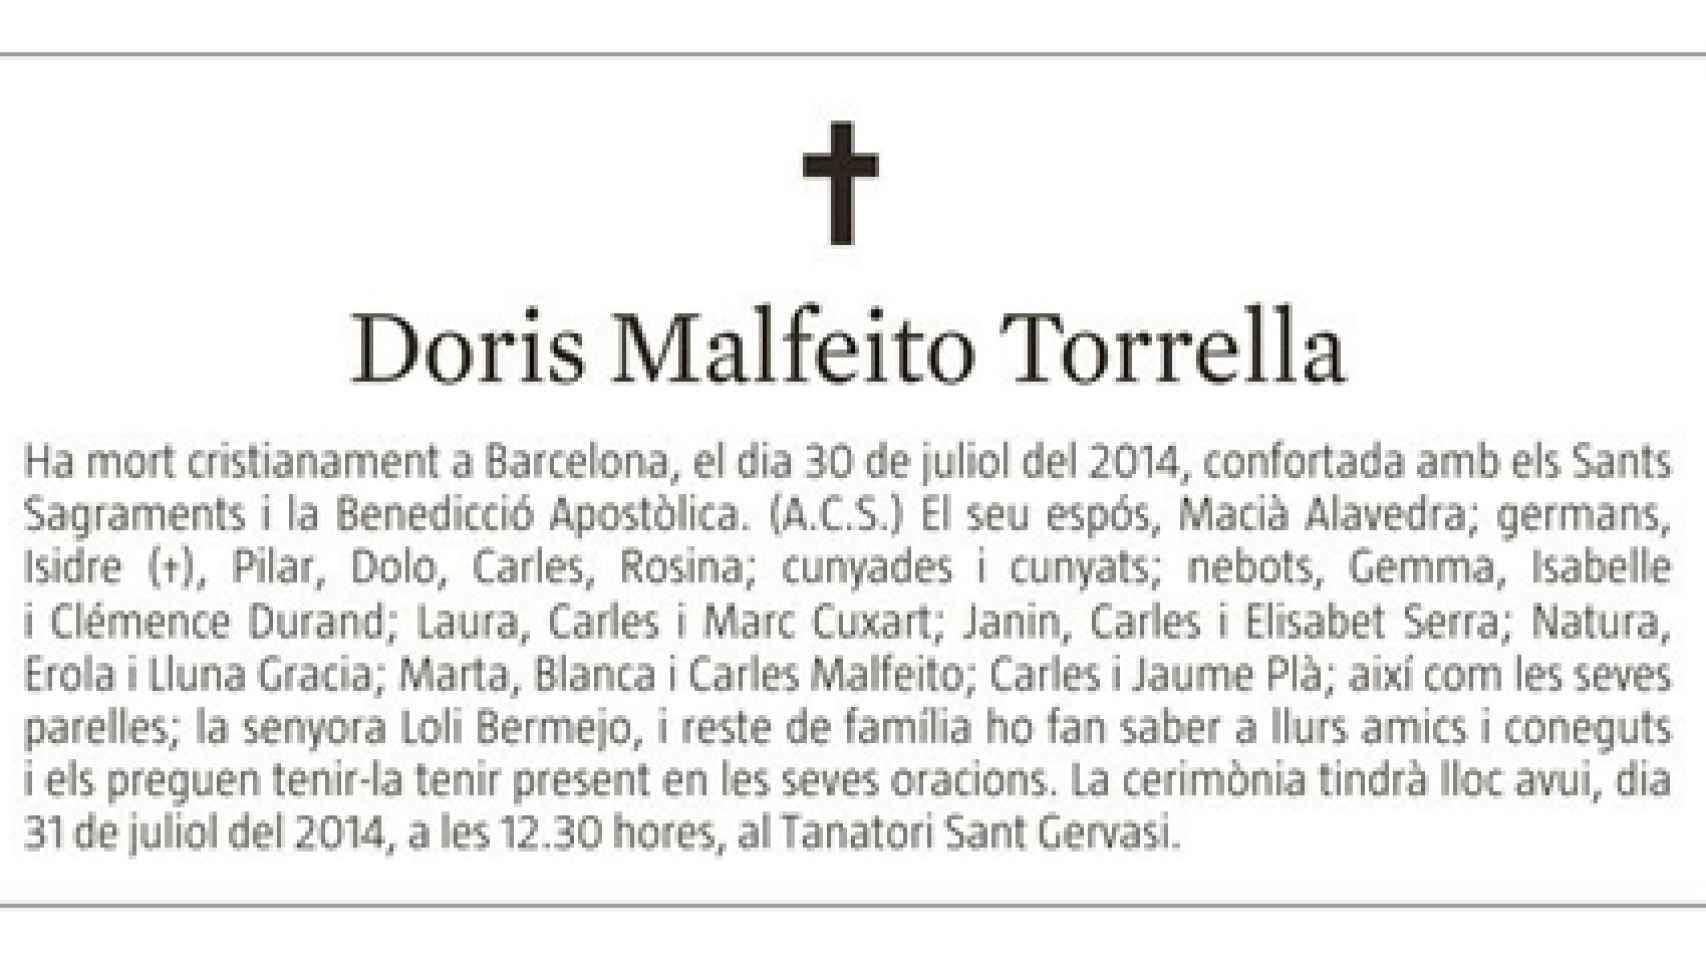 La esquela que publicó La Vanguardia por la muerte de Doris Malfeito